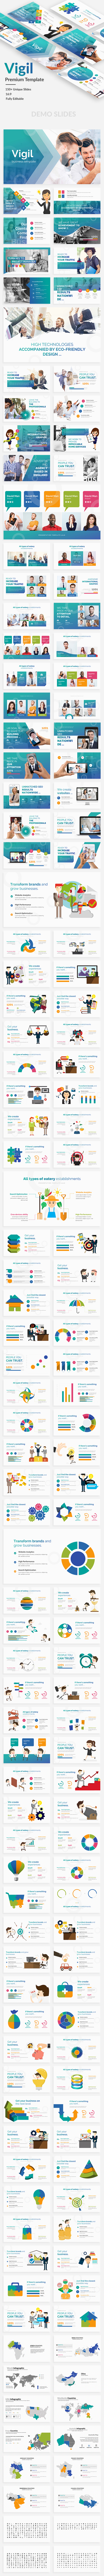 Vigil Business Premium Keynote Template - Business Keynote Templates